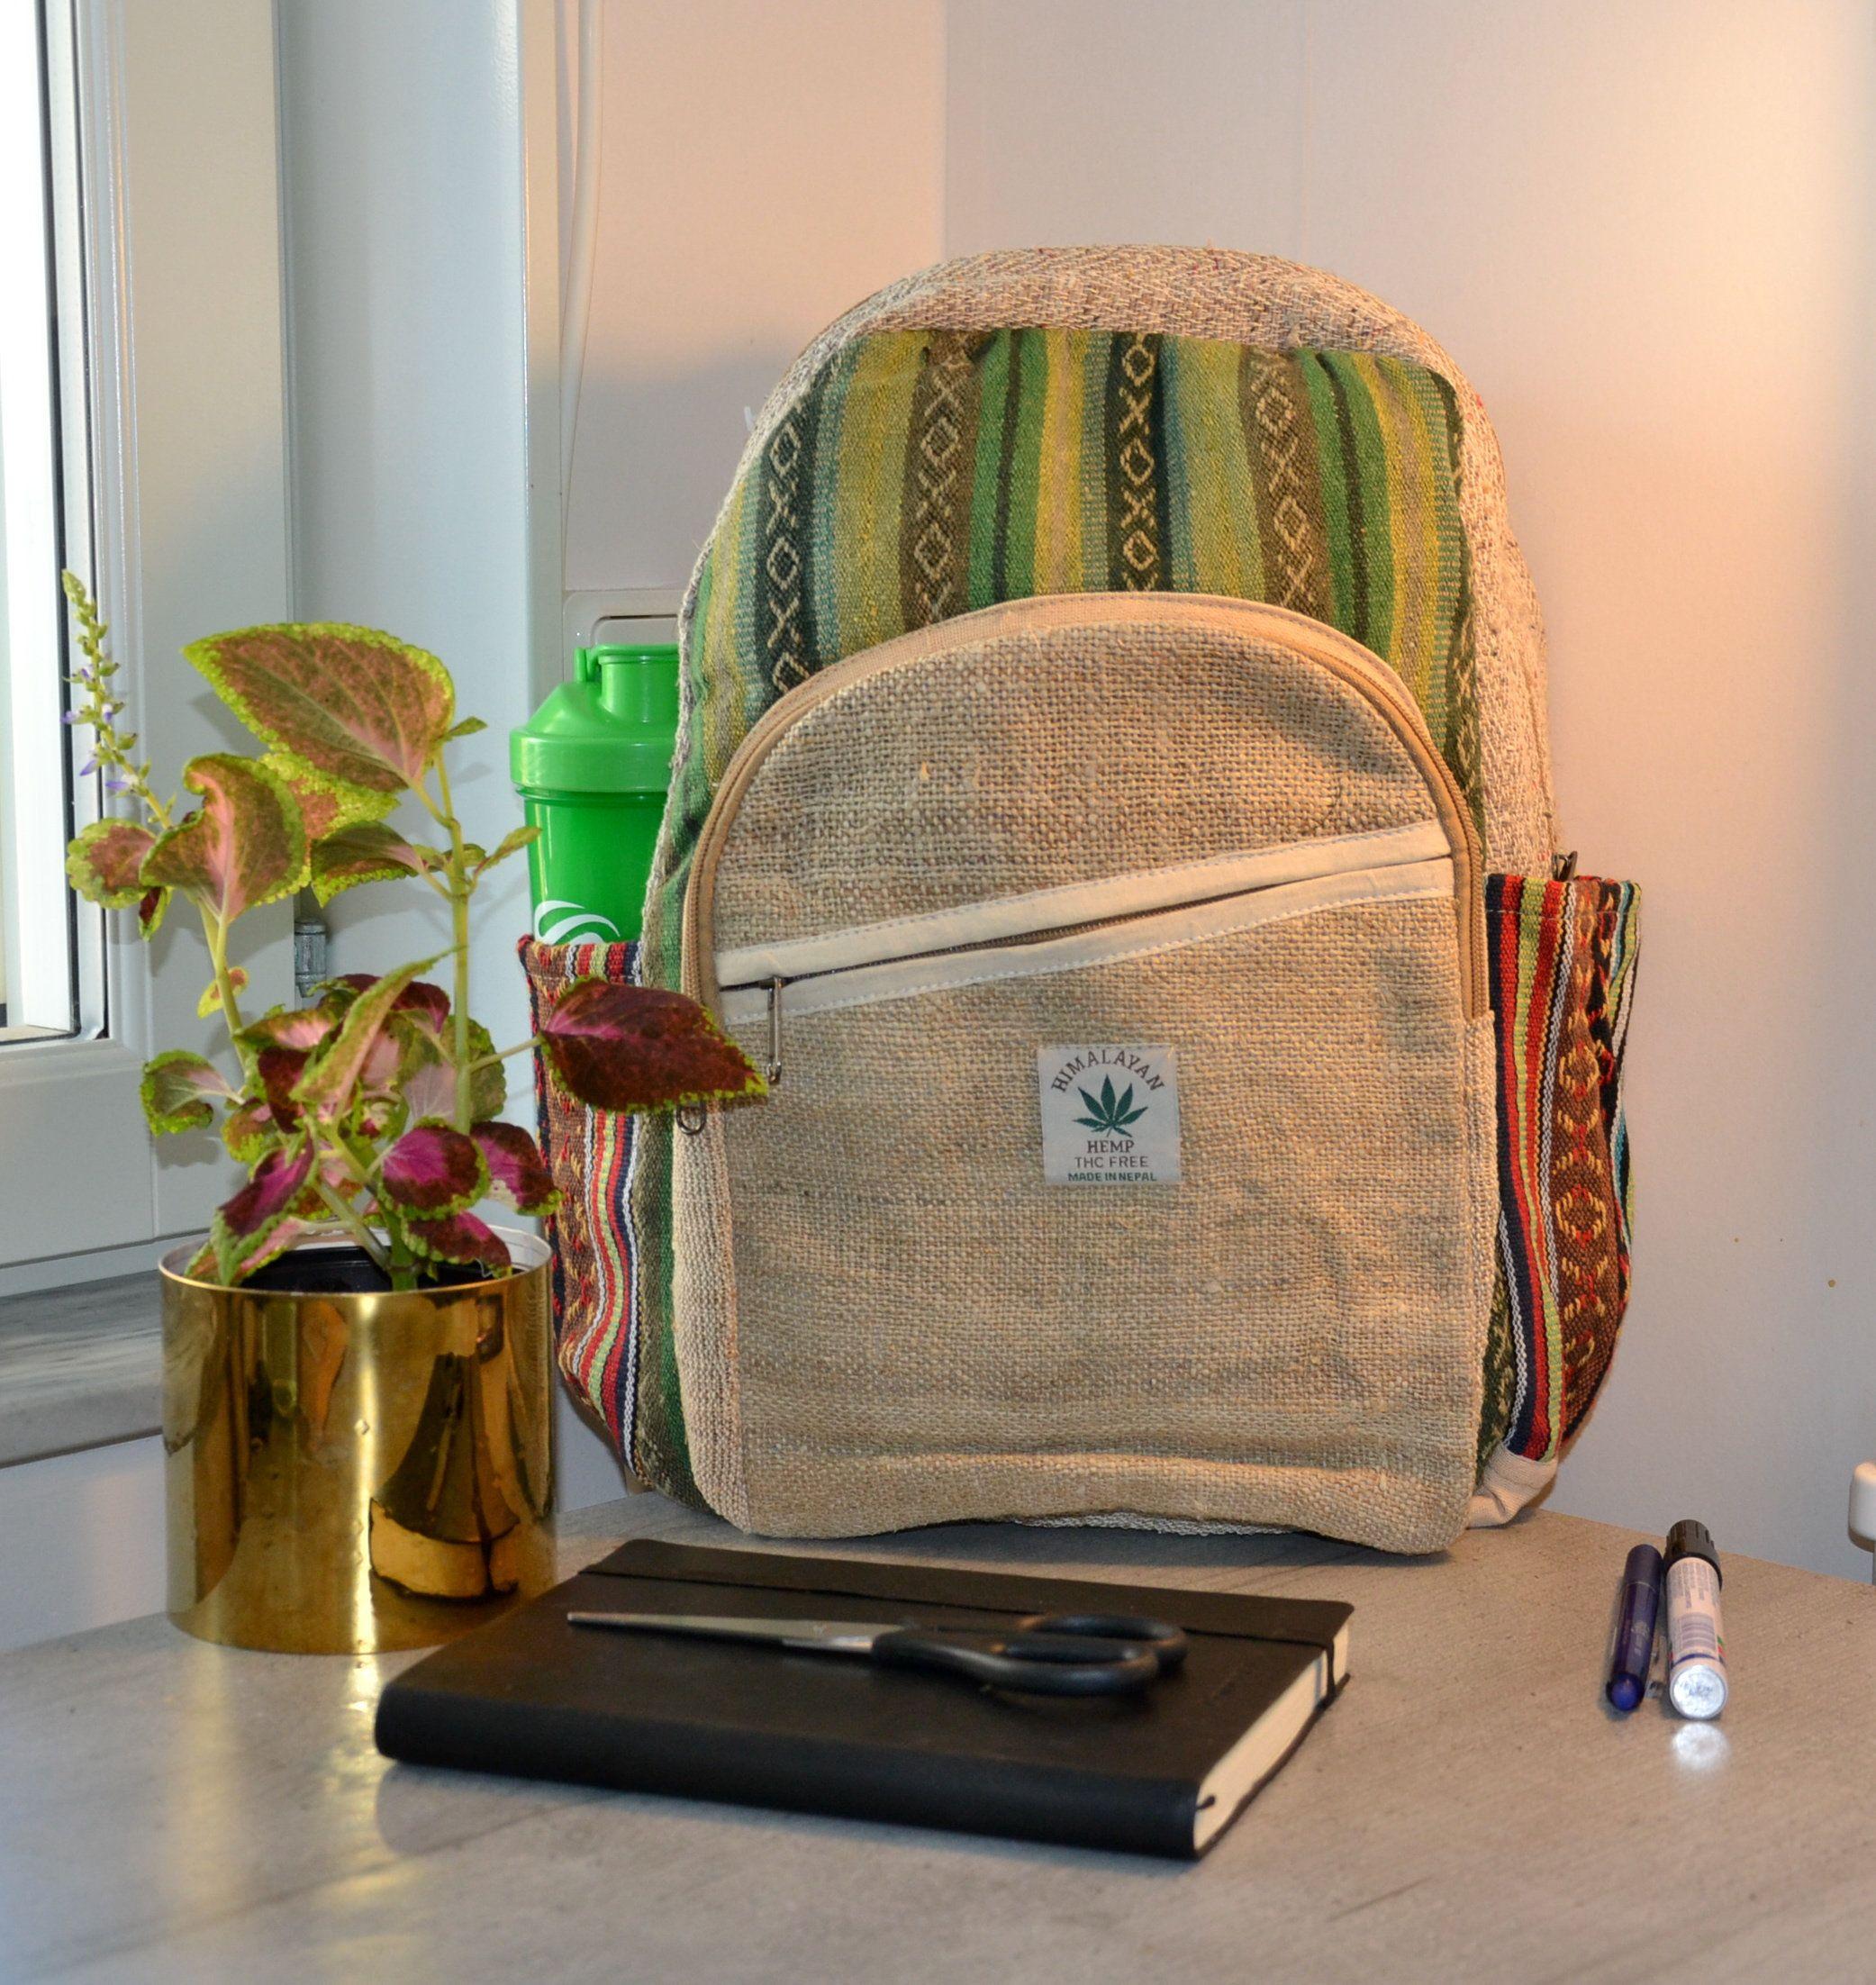 Eco Friendly Bag Vegan Hippie Bag Handmade Bag Hemp Backpack| Hemp Bag